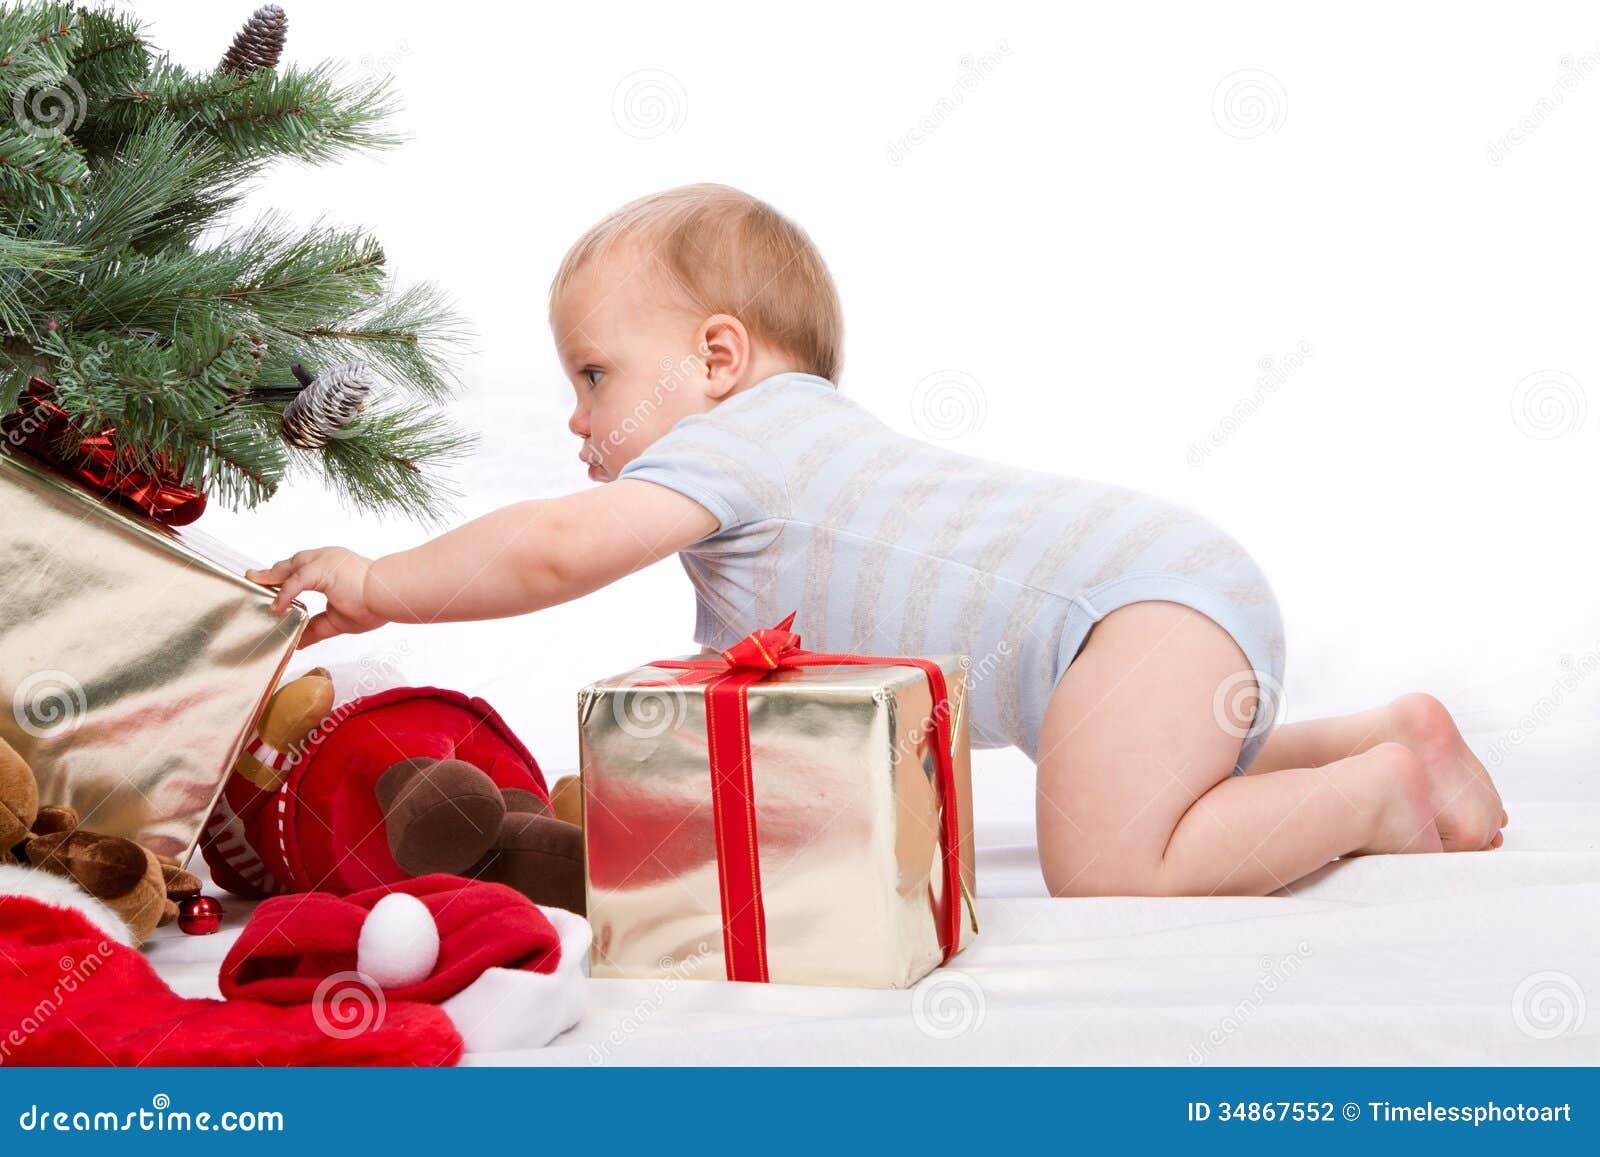 Santa Baby Boy Reaching For Christmas Gift. Stock Photo - Image of ...